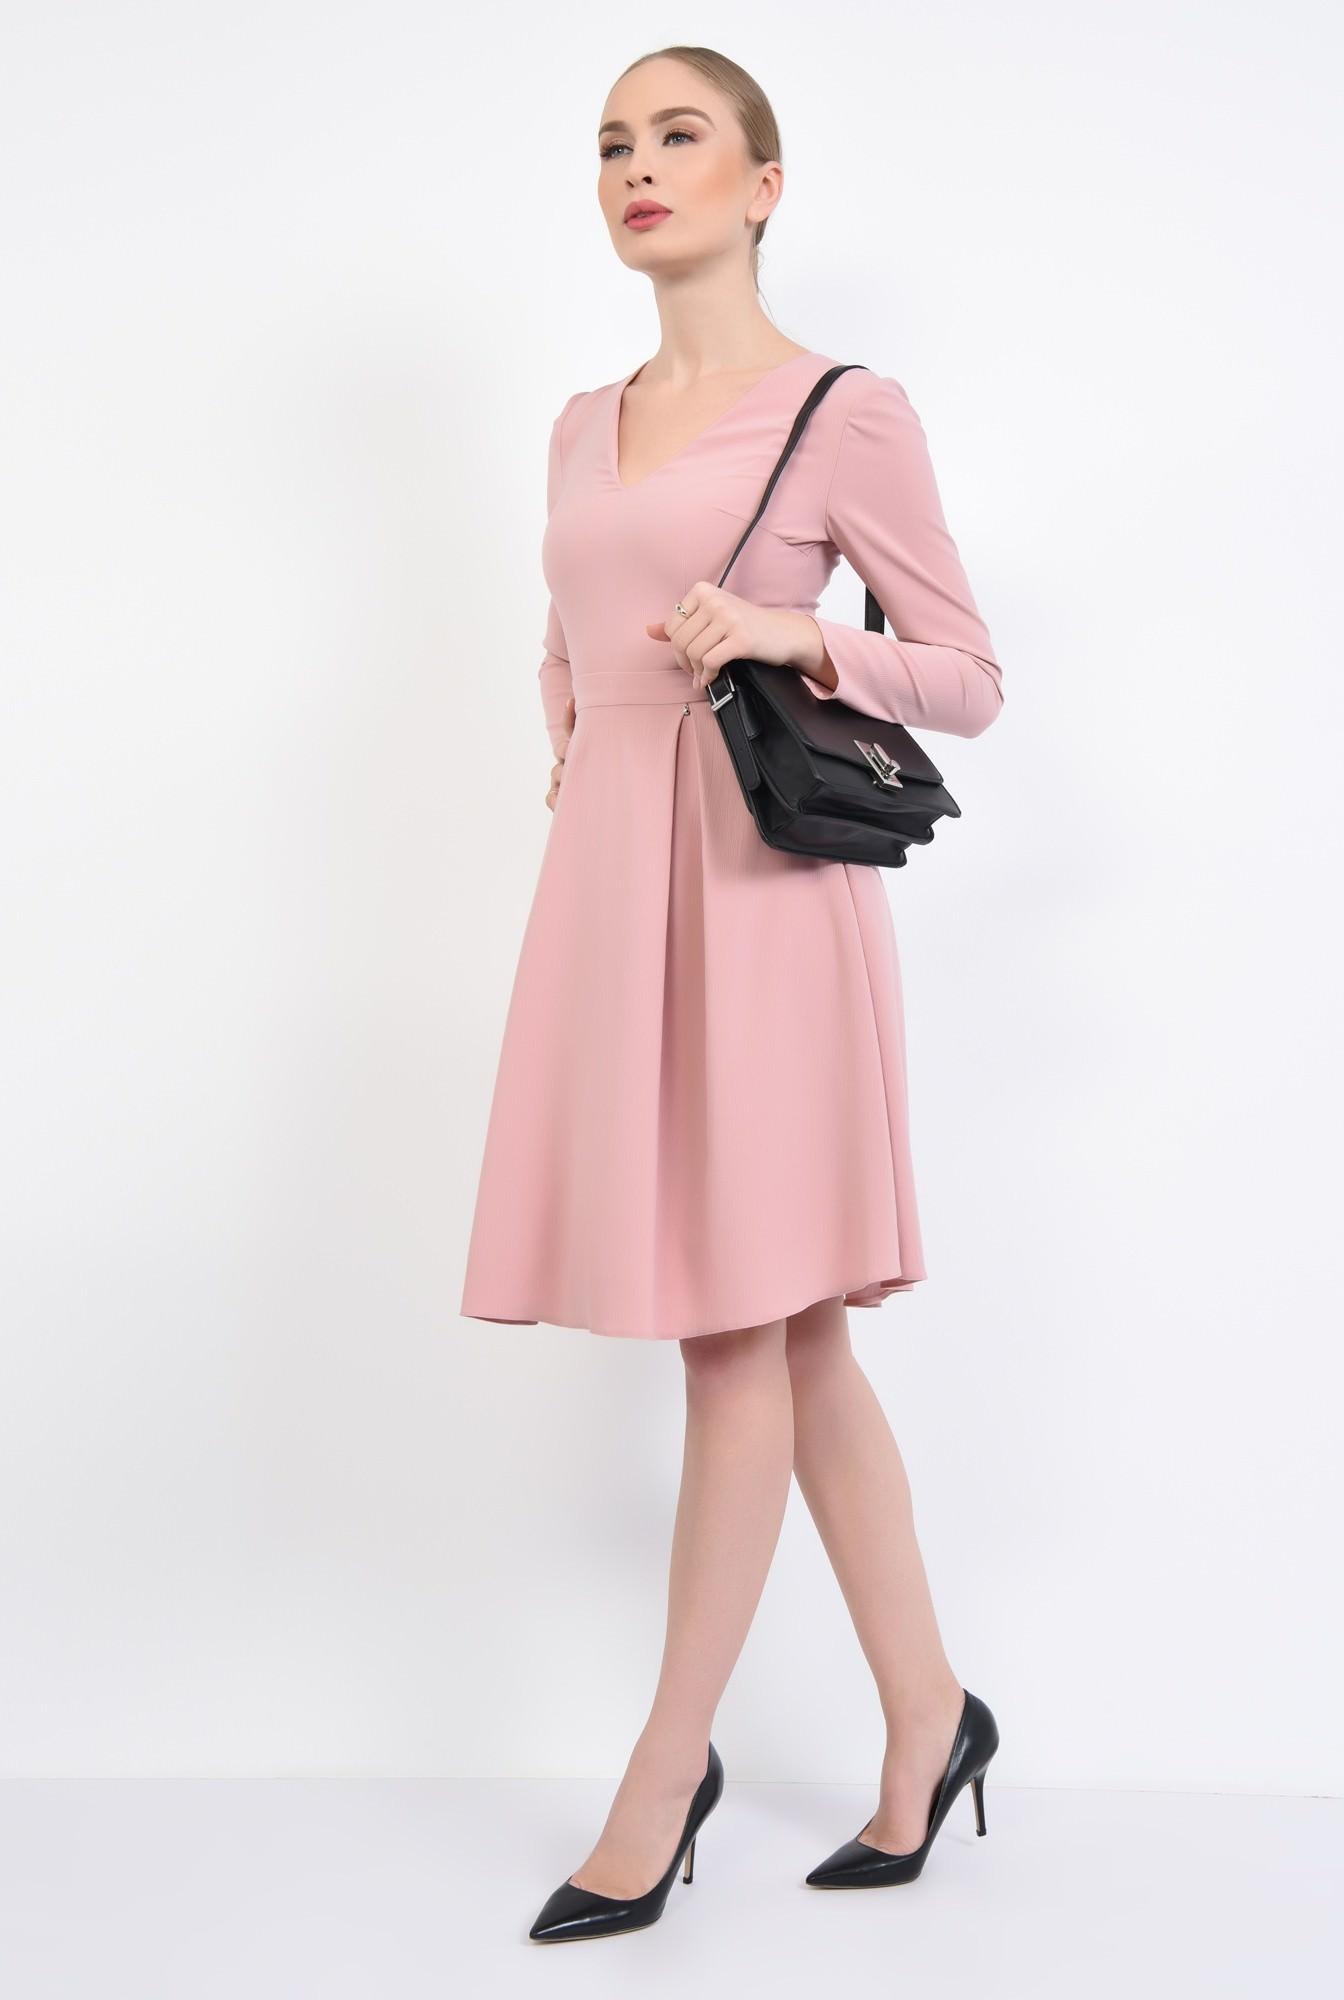 3 - Rochie de zi evazata, roz